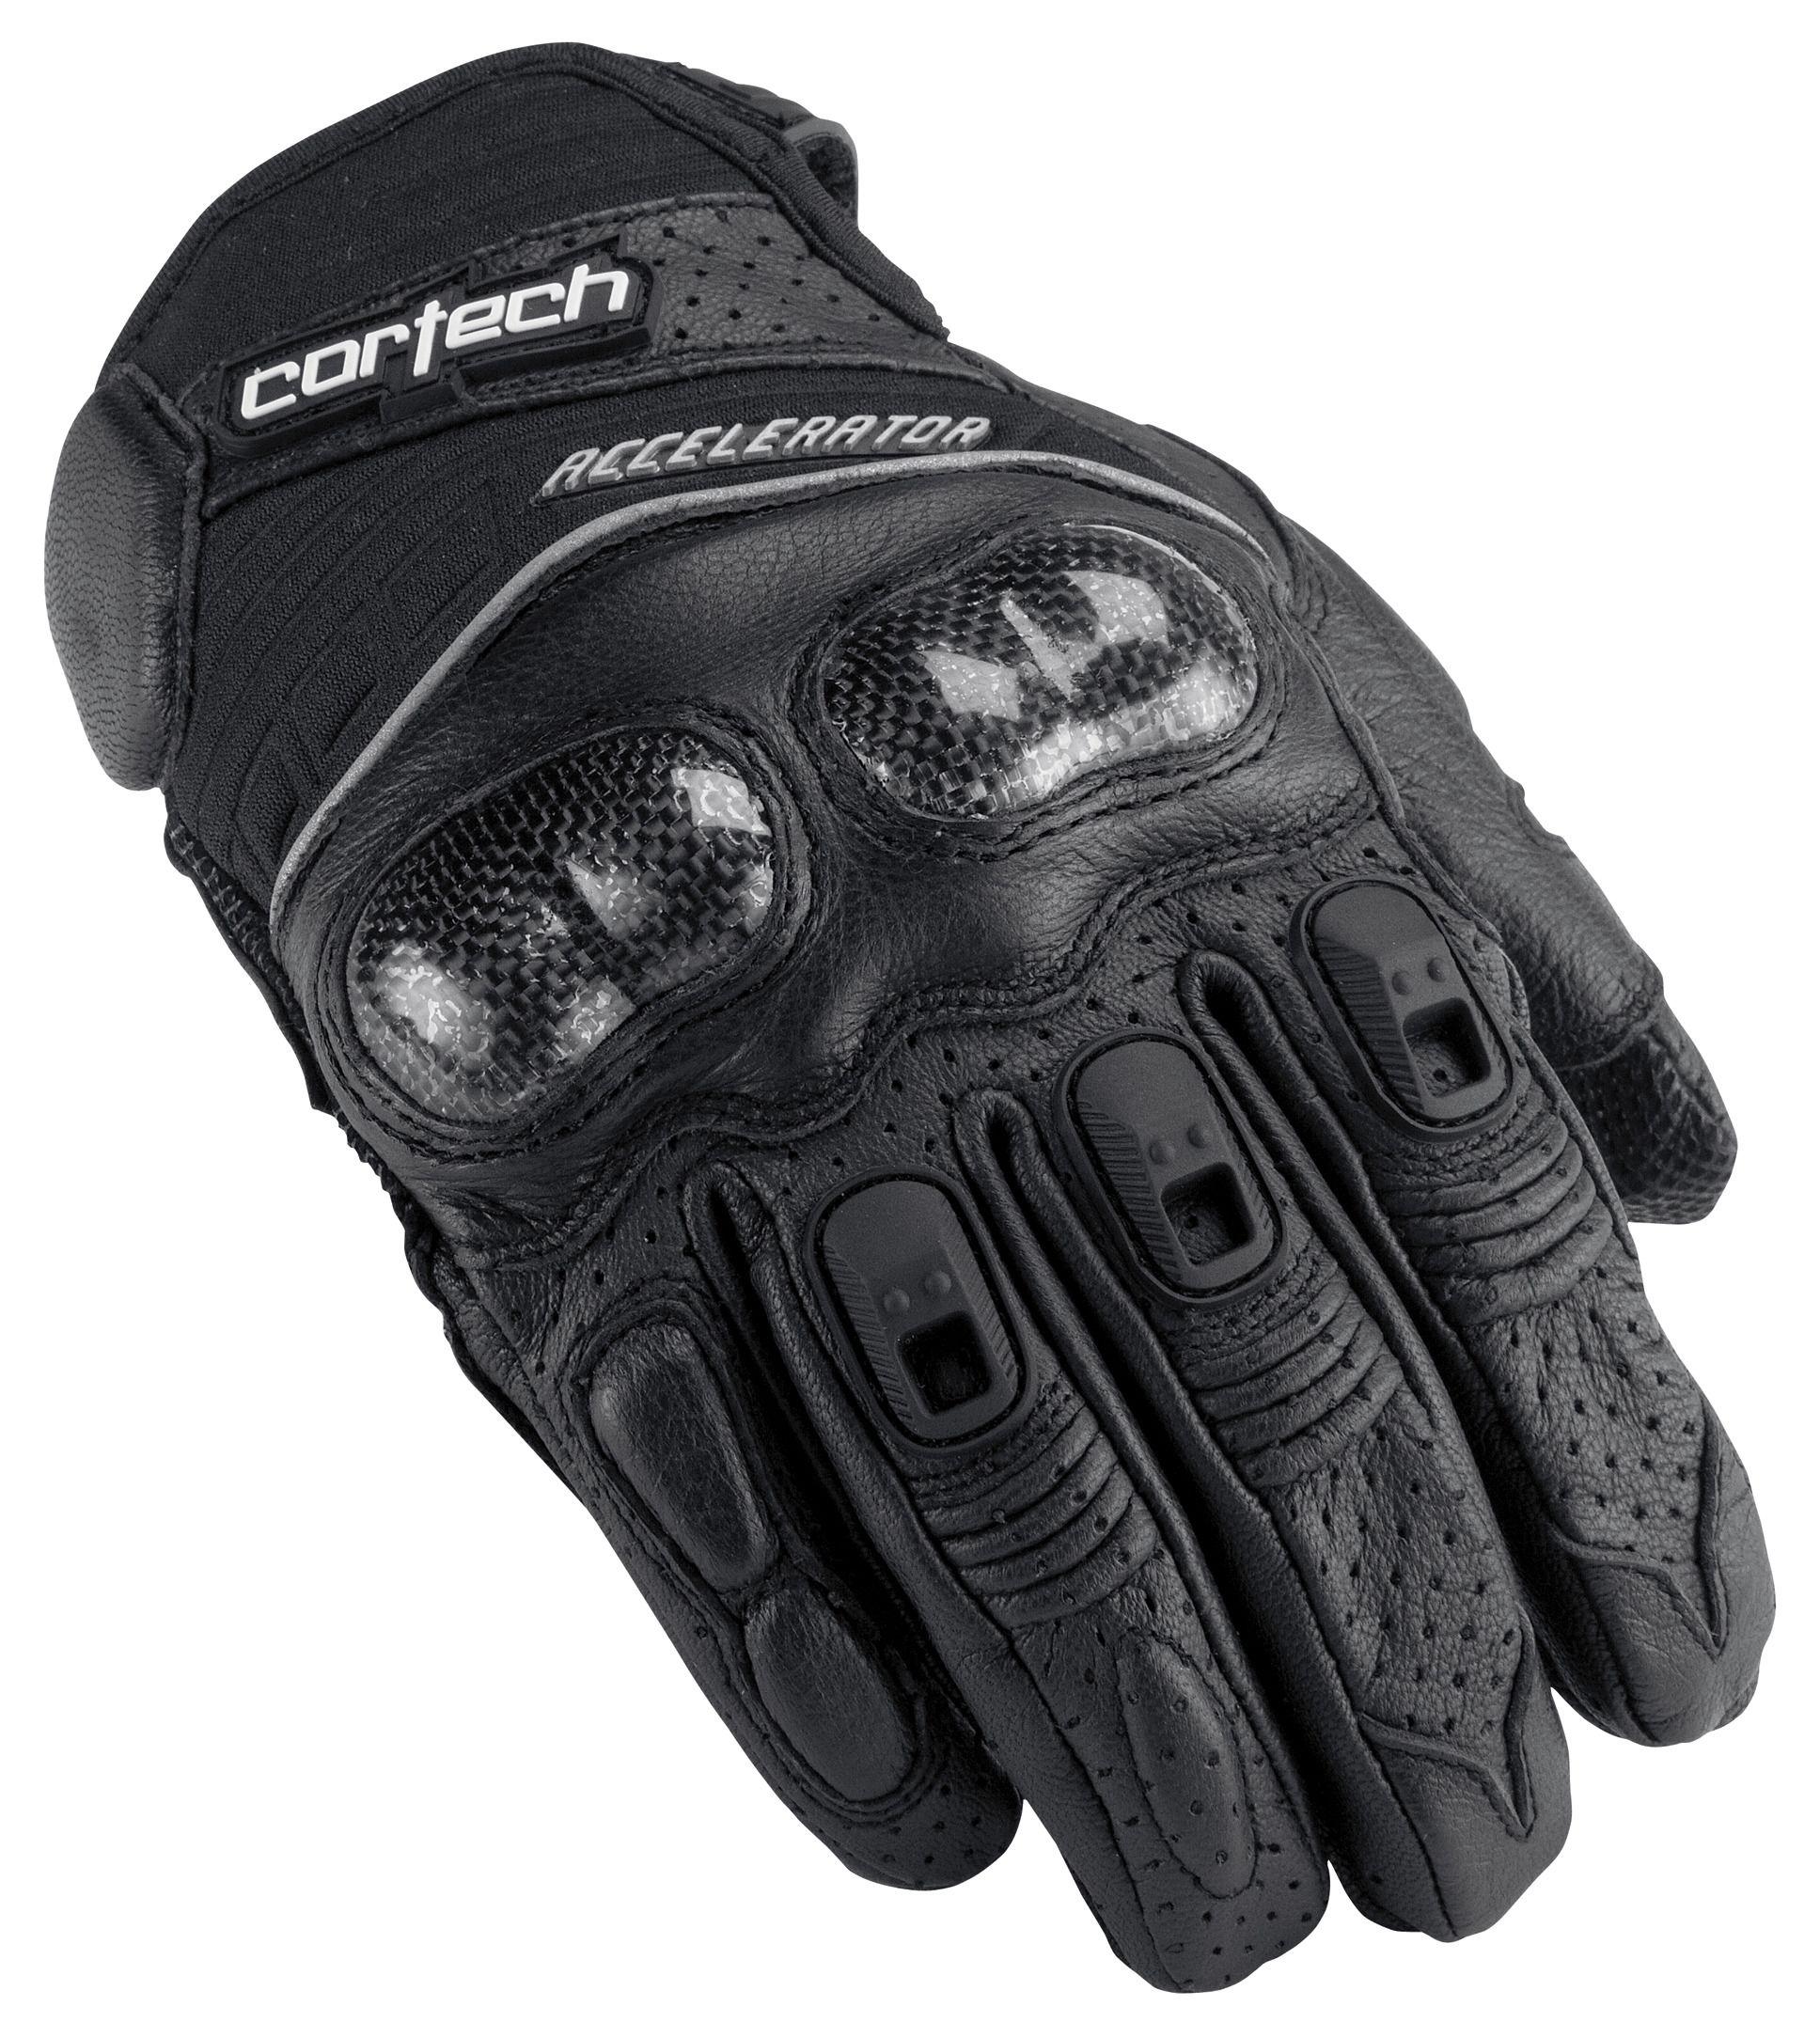 Motorcycle gloves xl - Motorcycle Gloves Xl 36